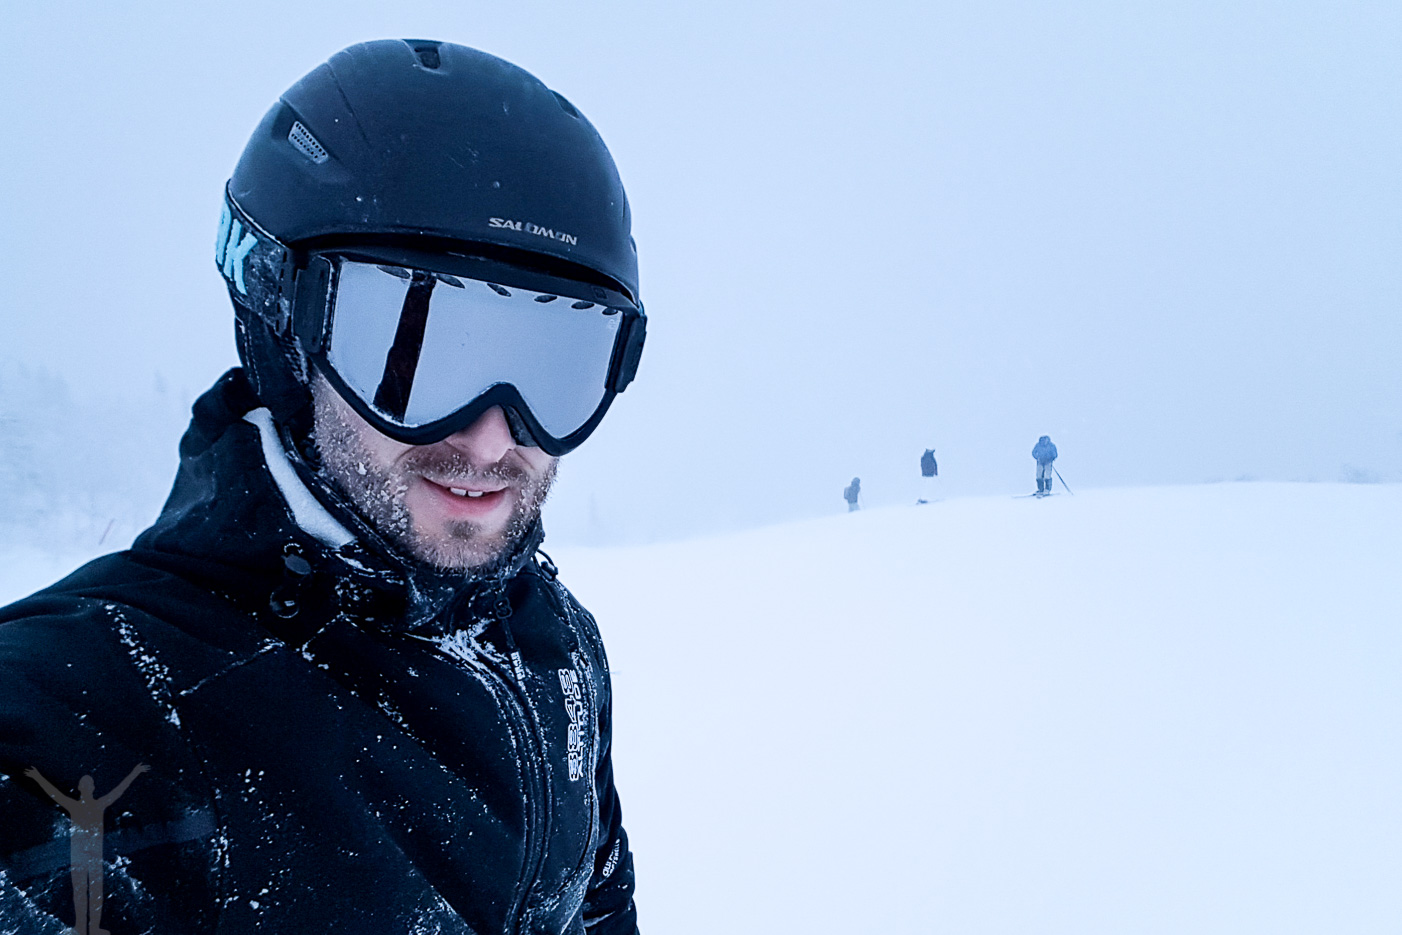 Dryden åker skidor i Åre